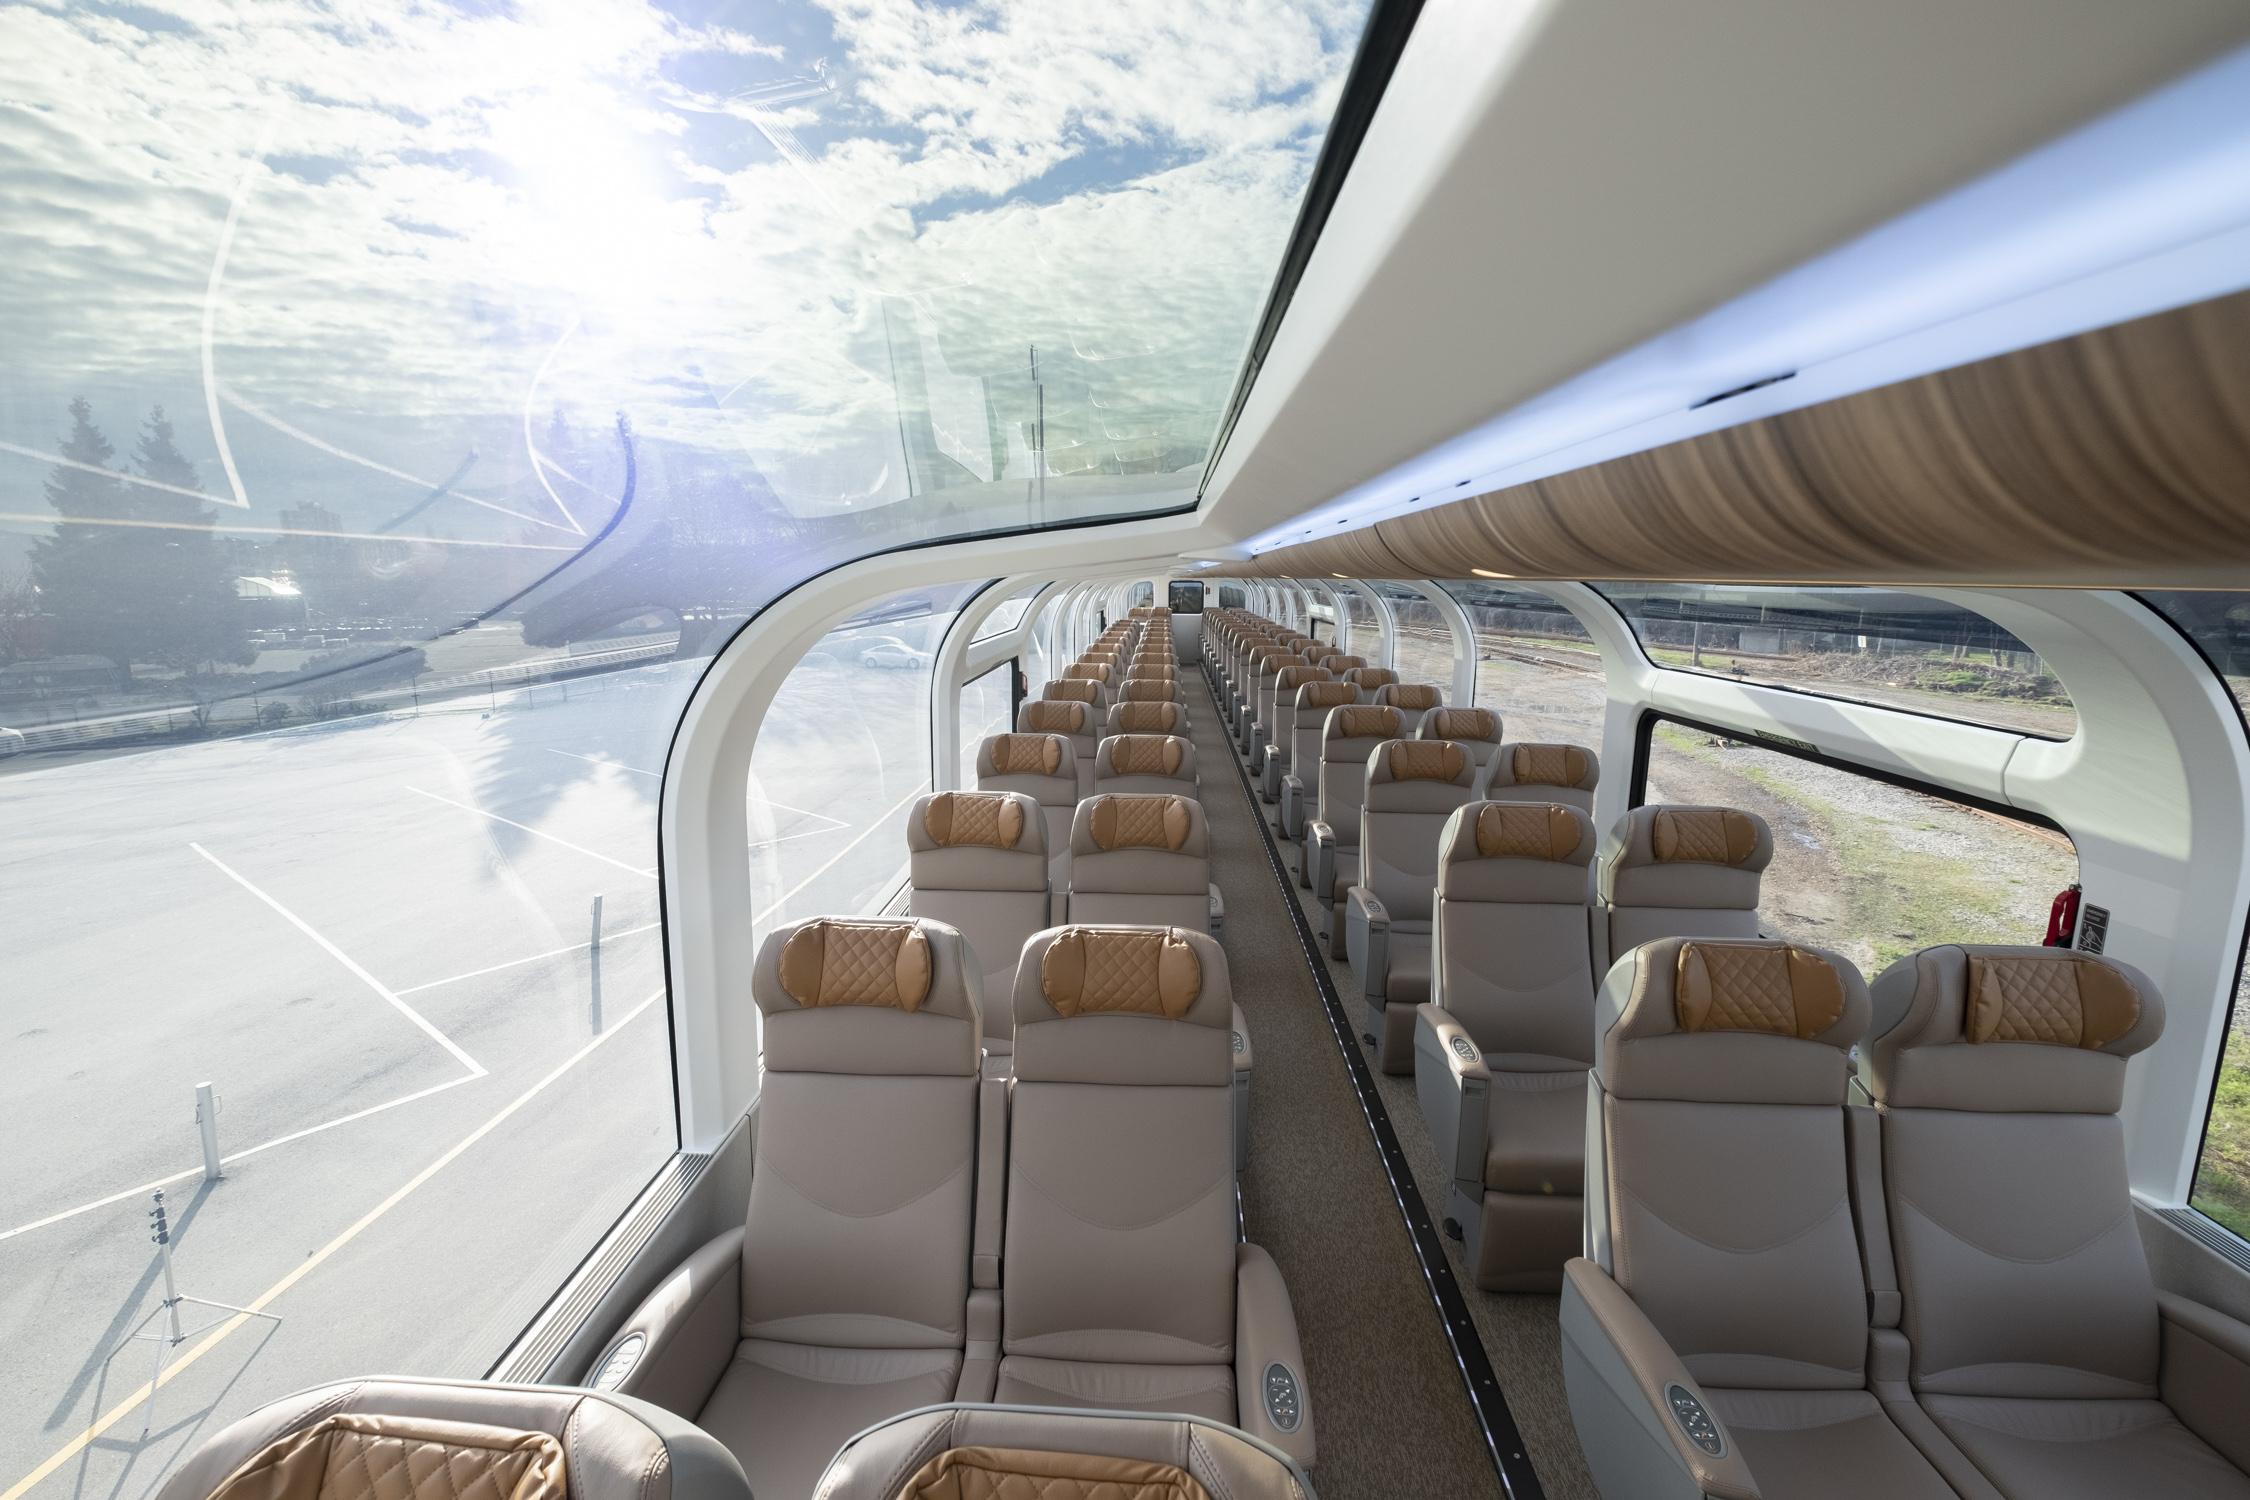 RM GoldLeaf rail car_upper level_Photo credit_Vincent L Chan